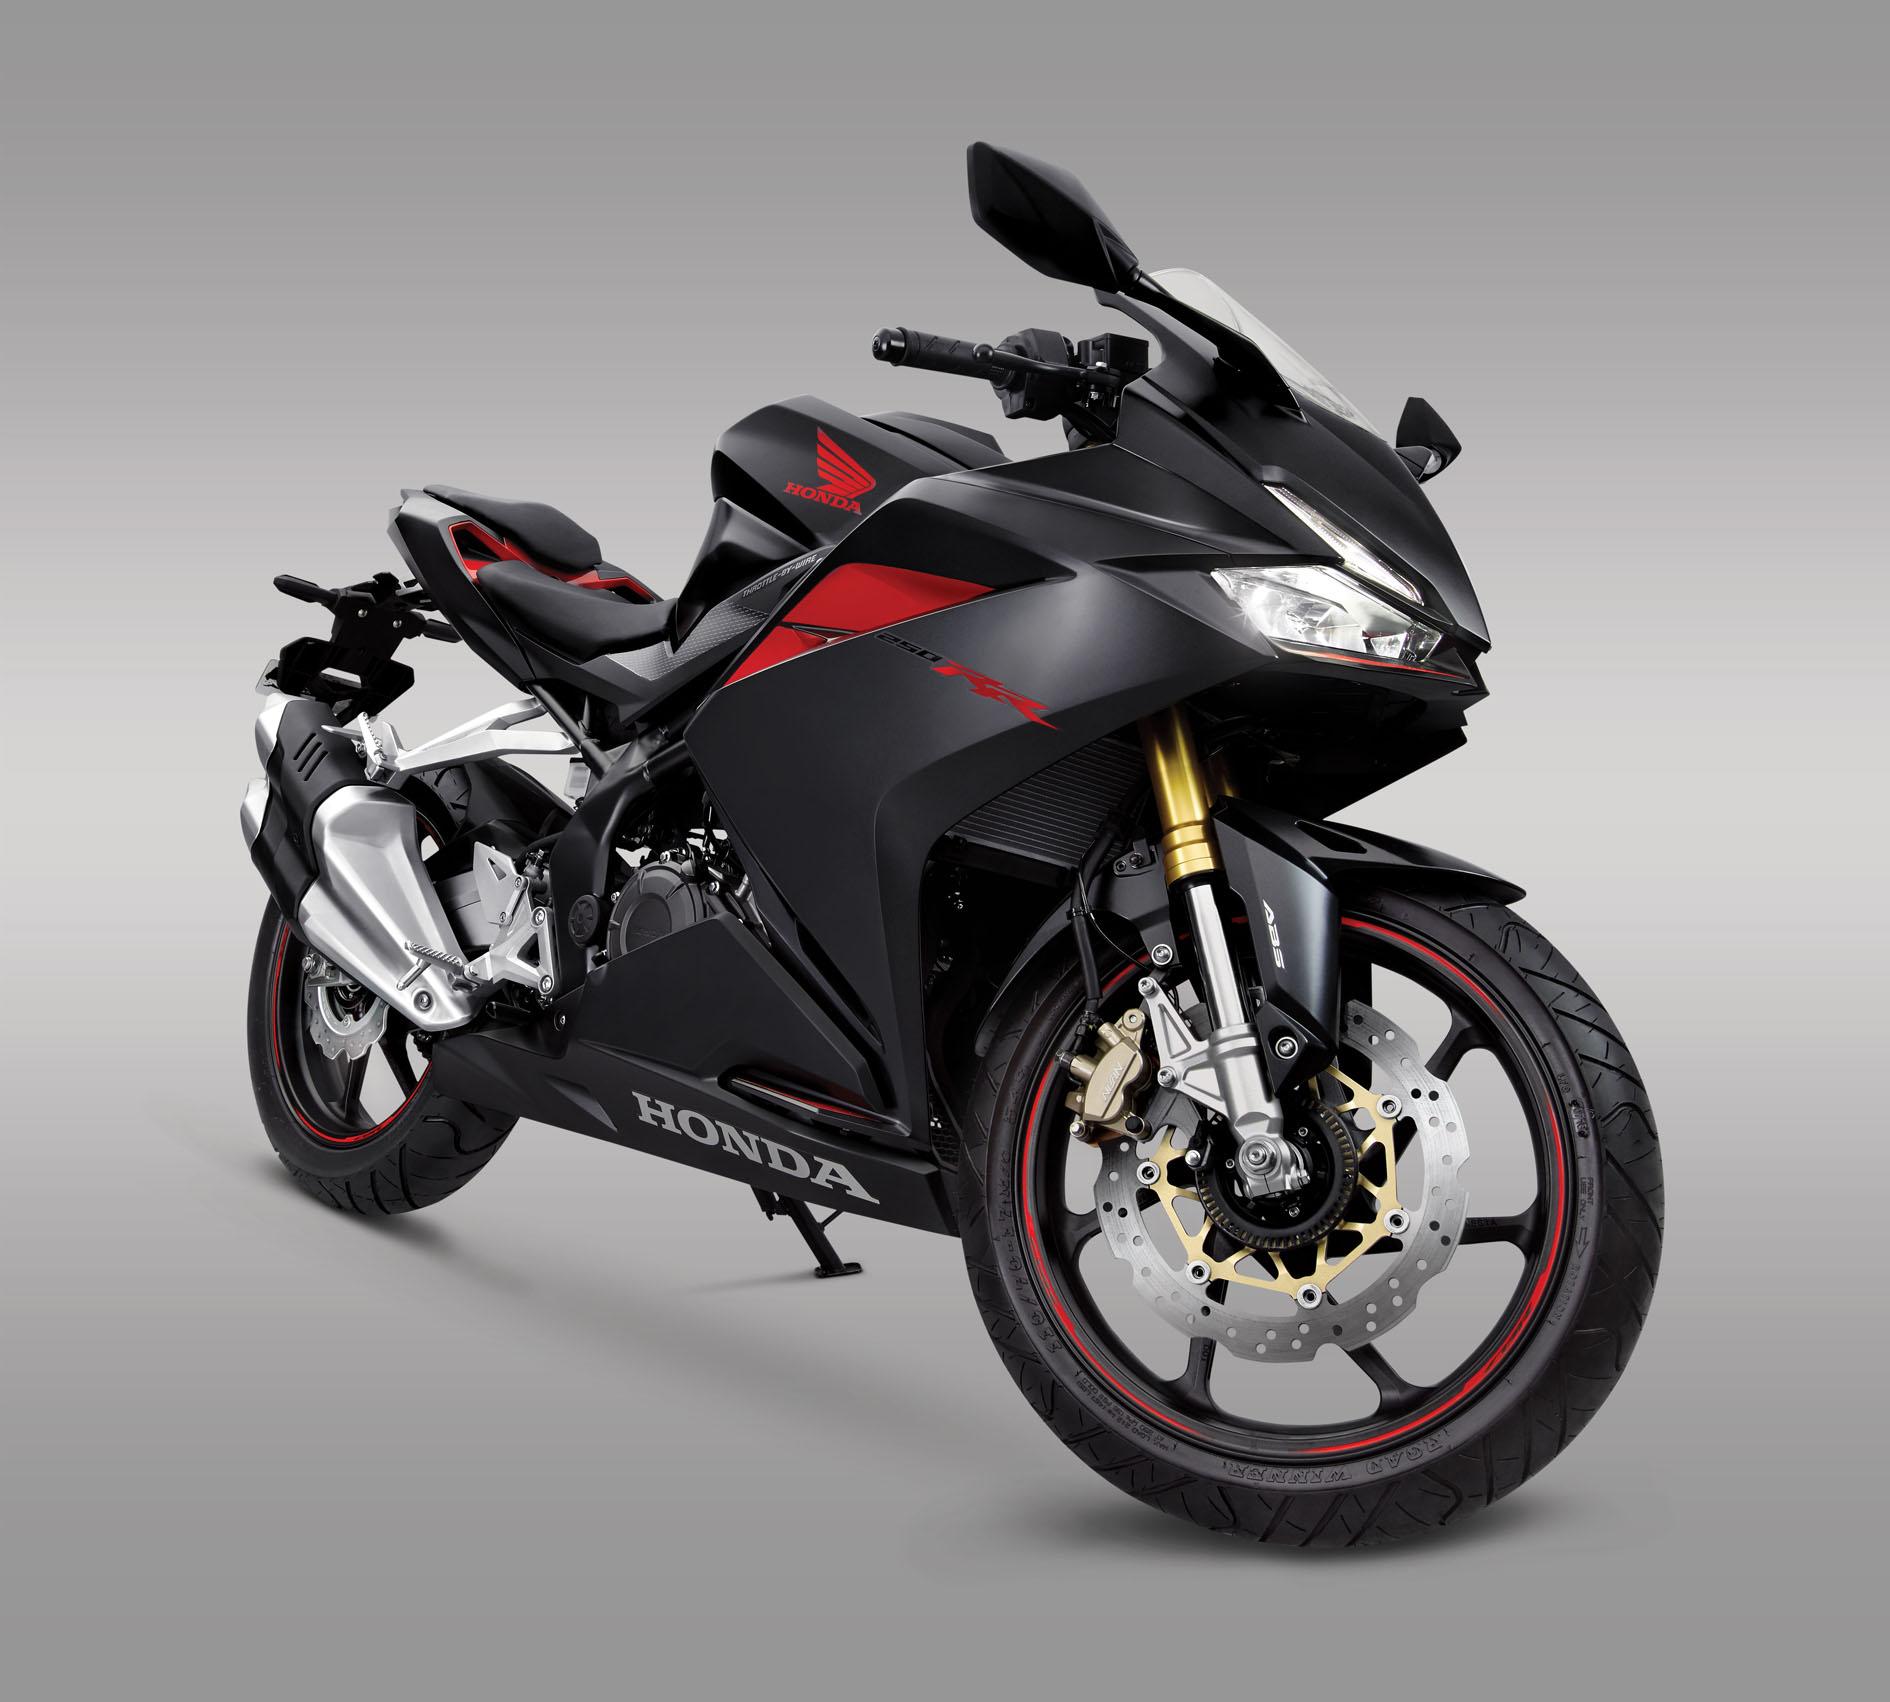 Wm Honda Cbr250rr 2